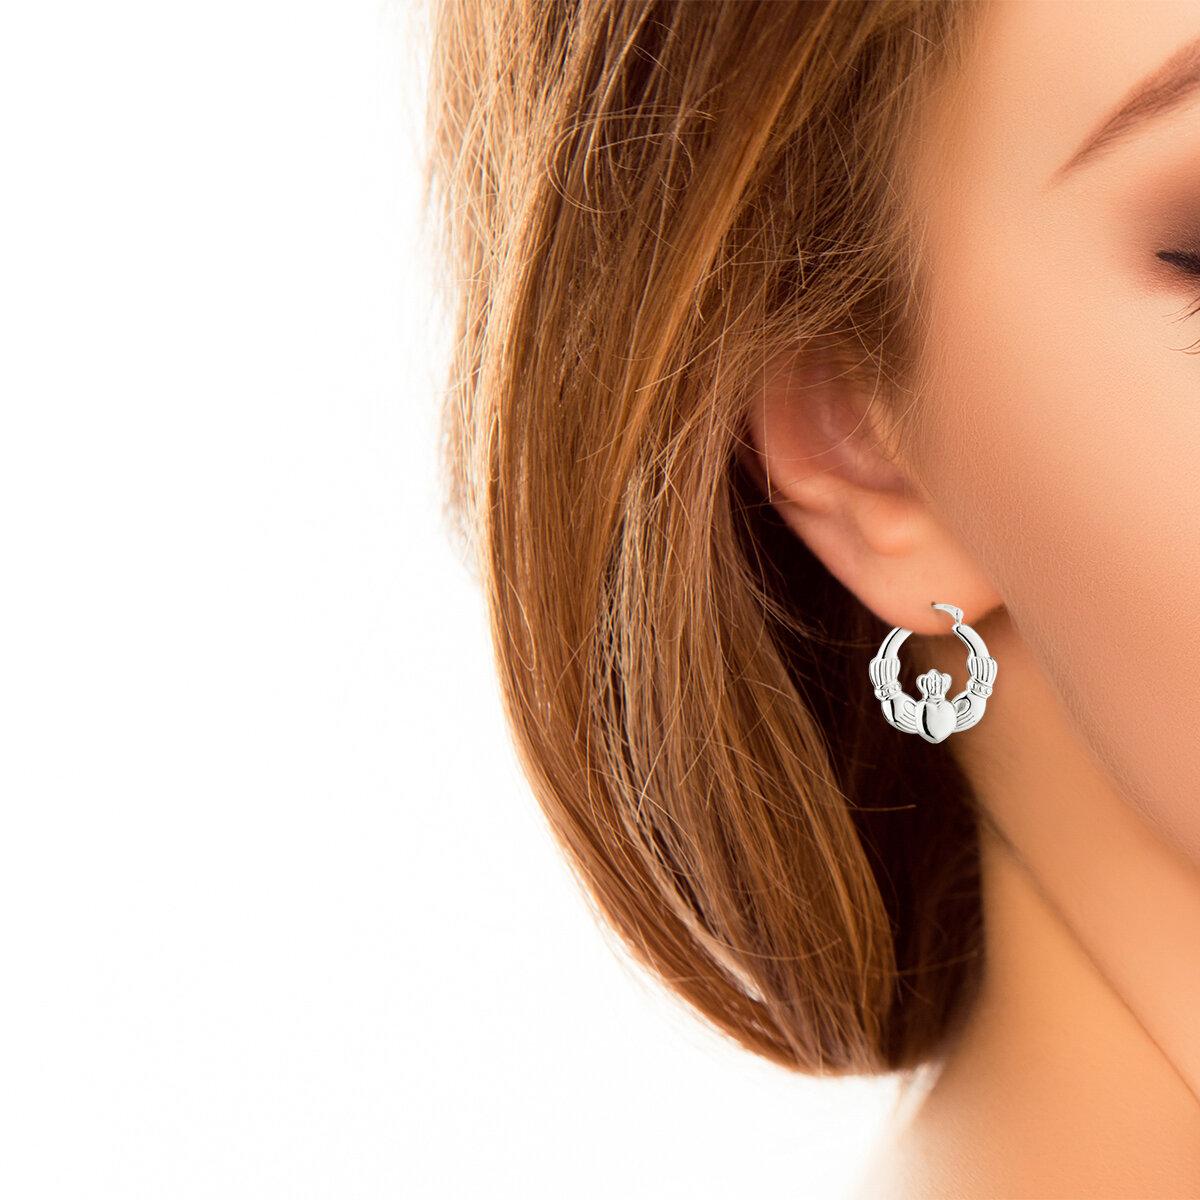 silver claddagh creole medium earrings S3526 presented on a model